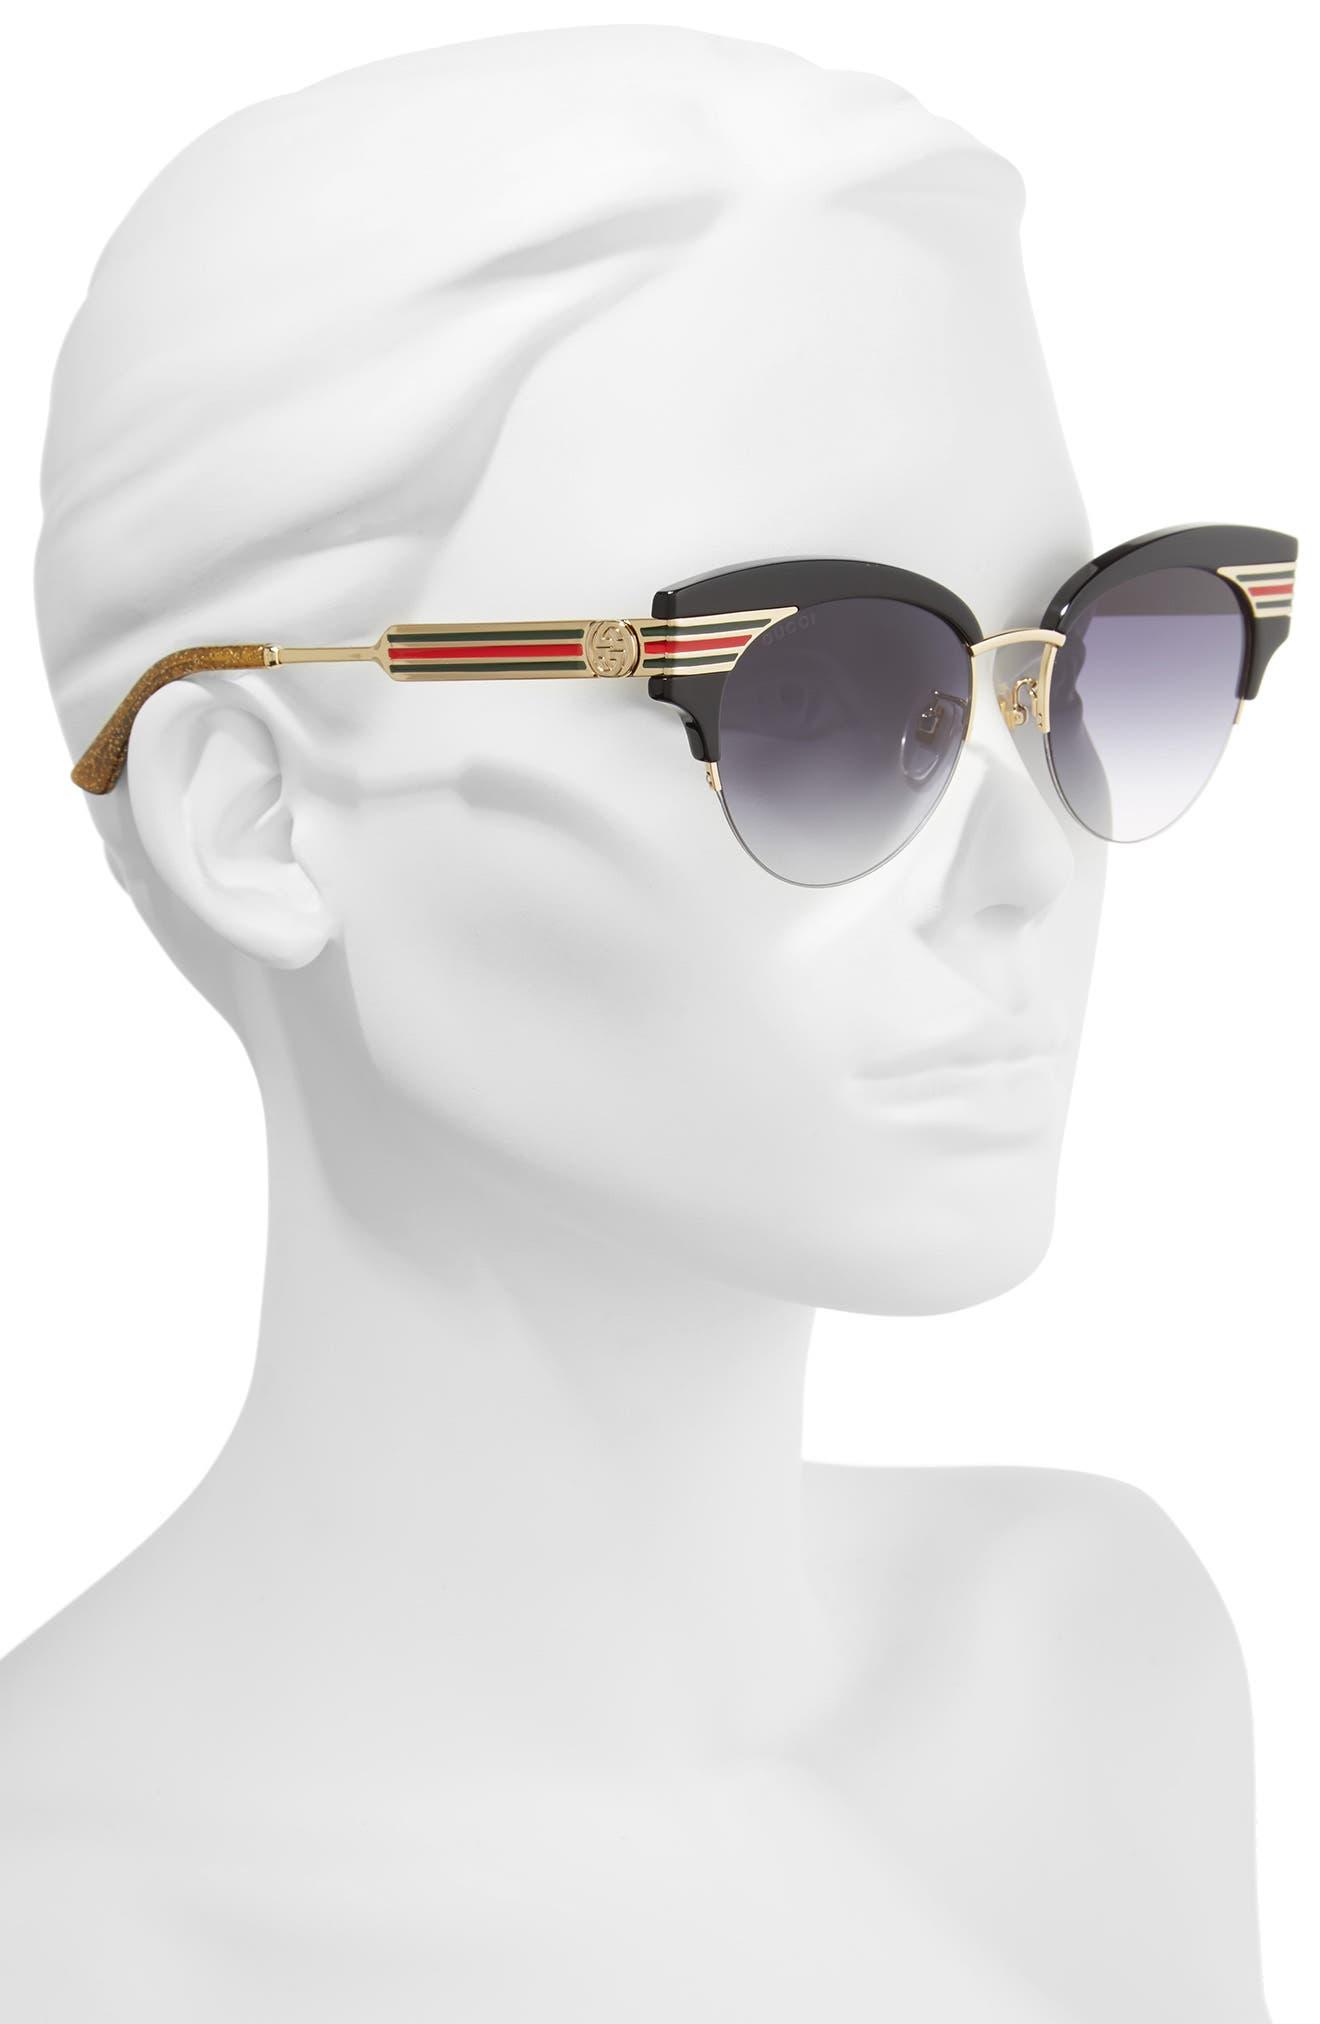 GUCCI, 53mm Cat Eye Sunglasses, Alternate thumbnail 2, color, GOLD